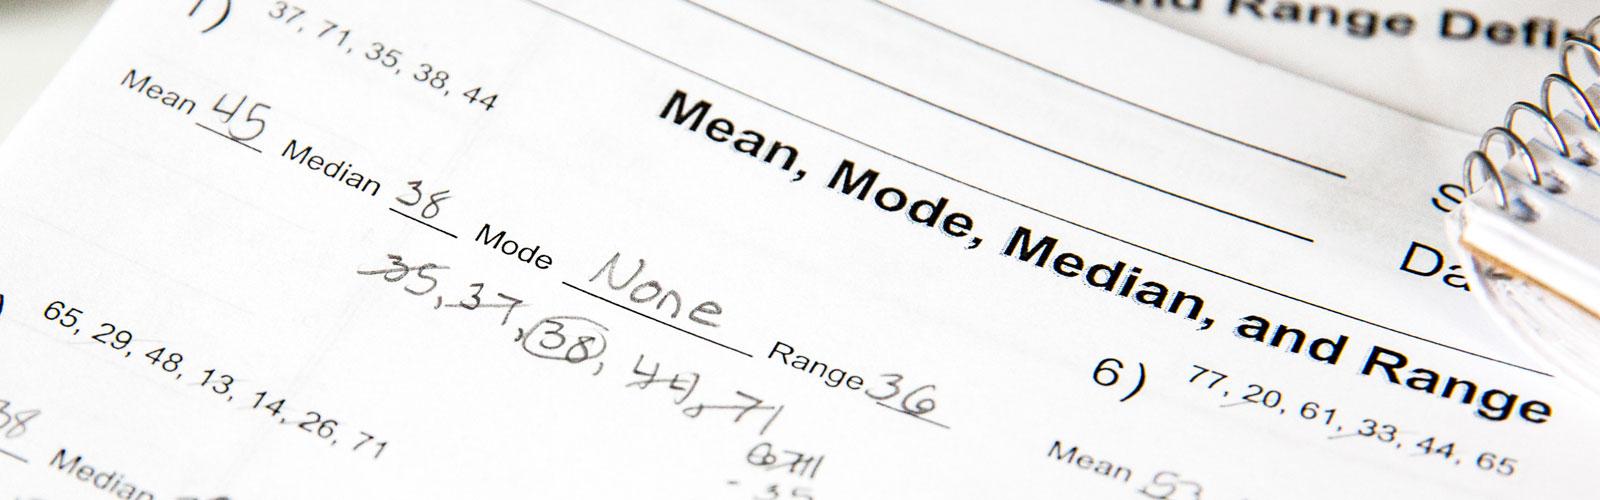 Close-up of a math worksheet on mean, median, mode, and range